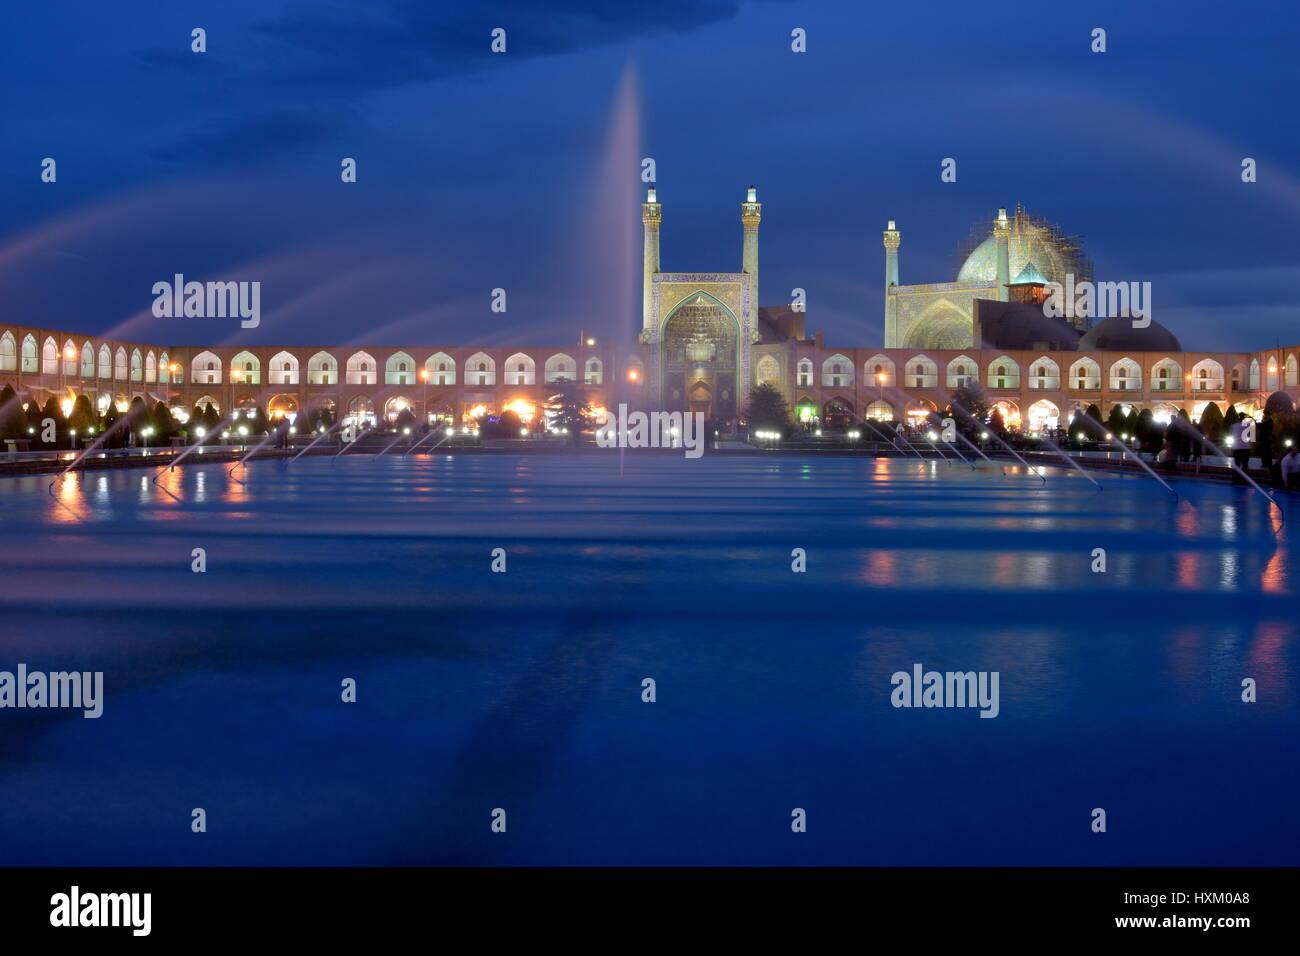 "Naqsh-e Jahan Square (Persian: میدان نقش جهان Maidān-e Naqsh-e Jahān; trans: ""Image of the World Square""), Esfahan, Stock Photo"